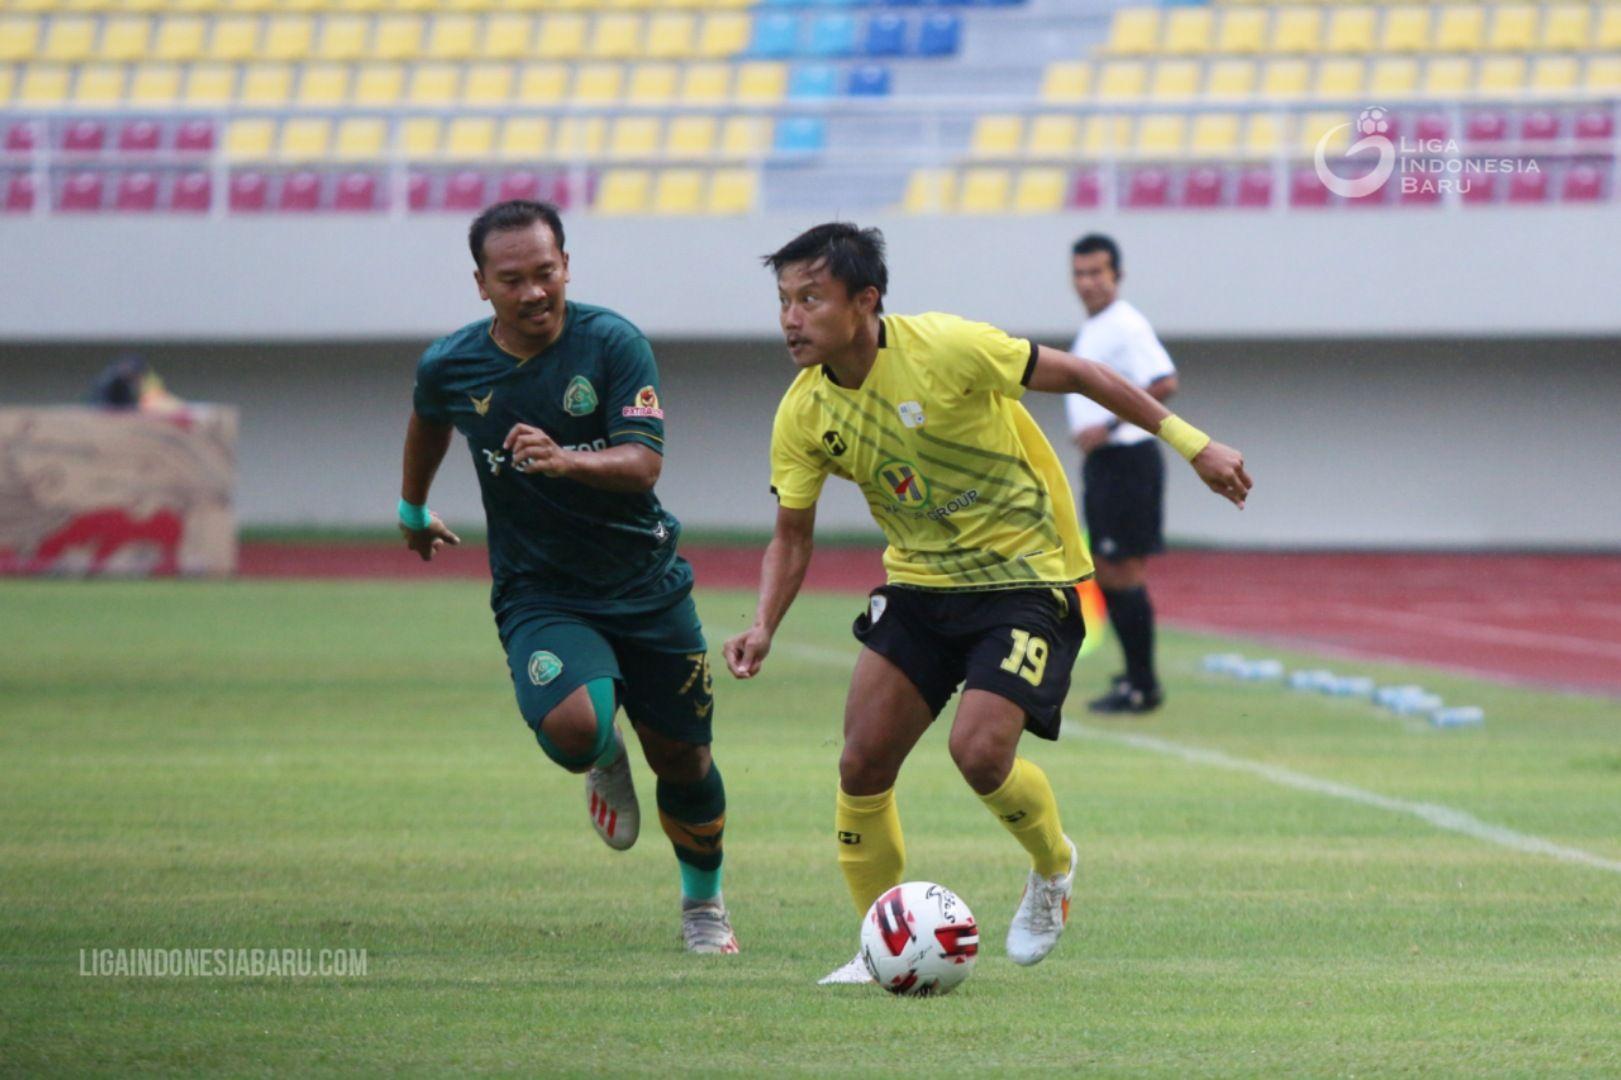 Wawan Febriyanto (kiri), penyerang Persikabo 1973, mengejar bola dari kaki bek Barito Putera, Muhammad Rifky, dalam laga terakhir Grup A Piala Menpora 2021 di Stadion Manahan, Solo, Selasa (30/3/2021).